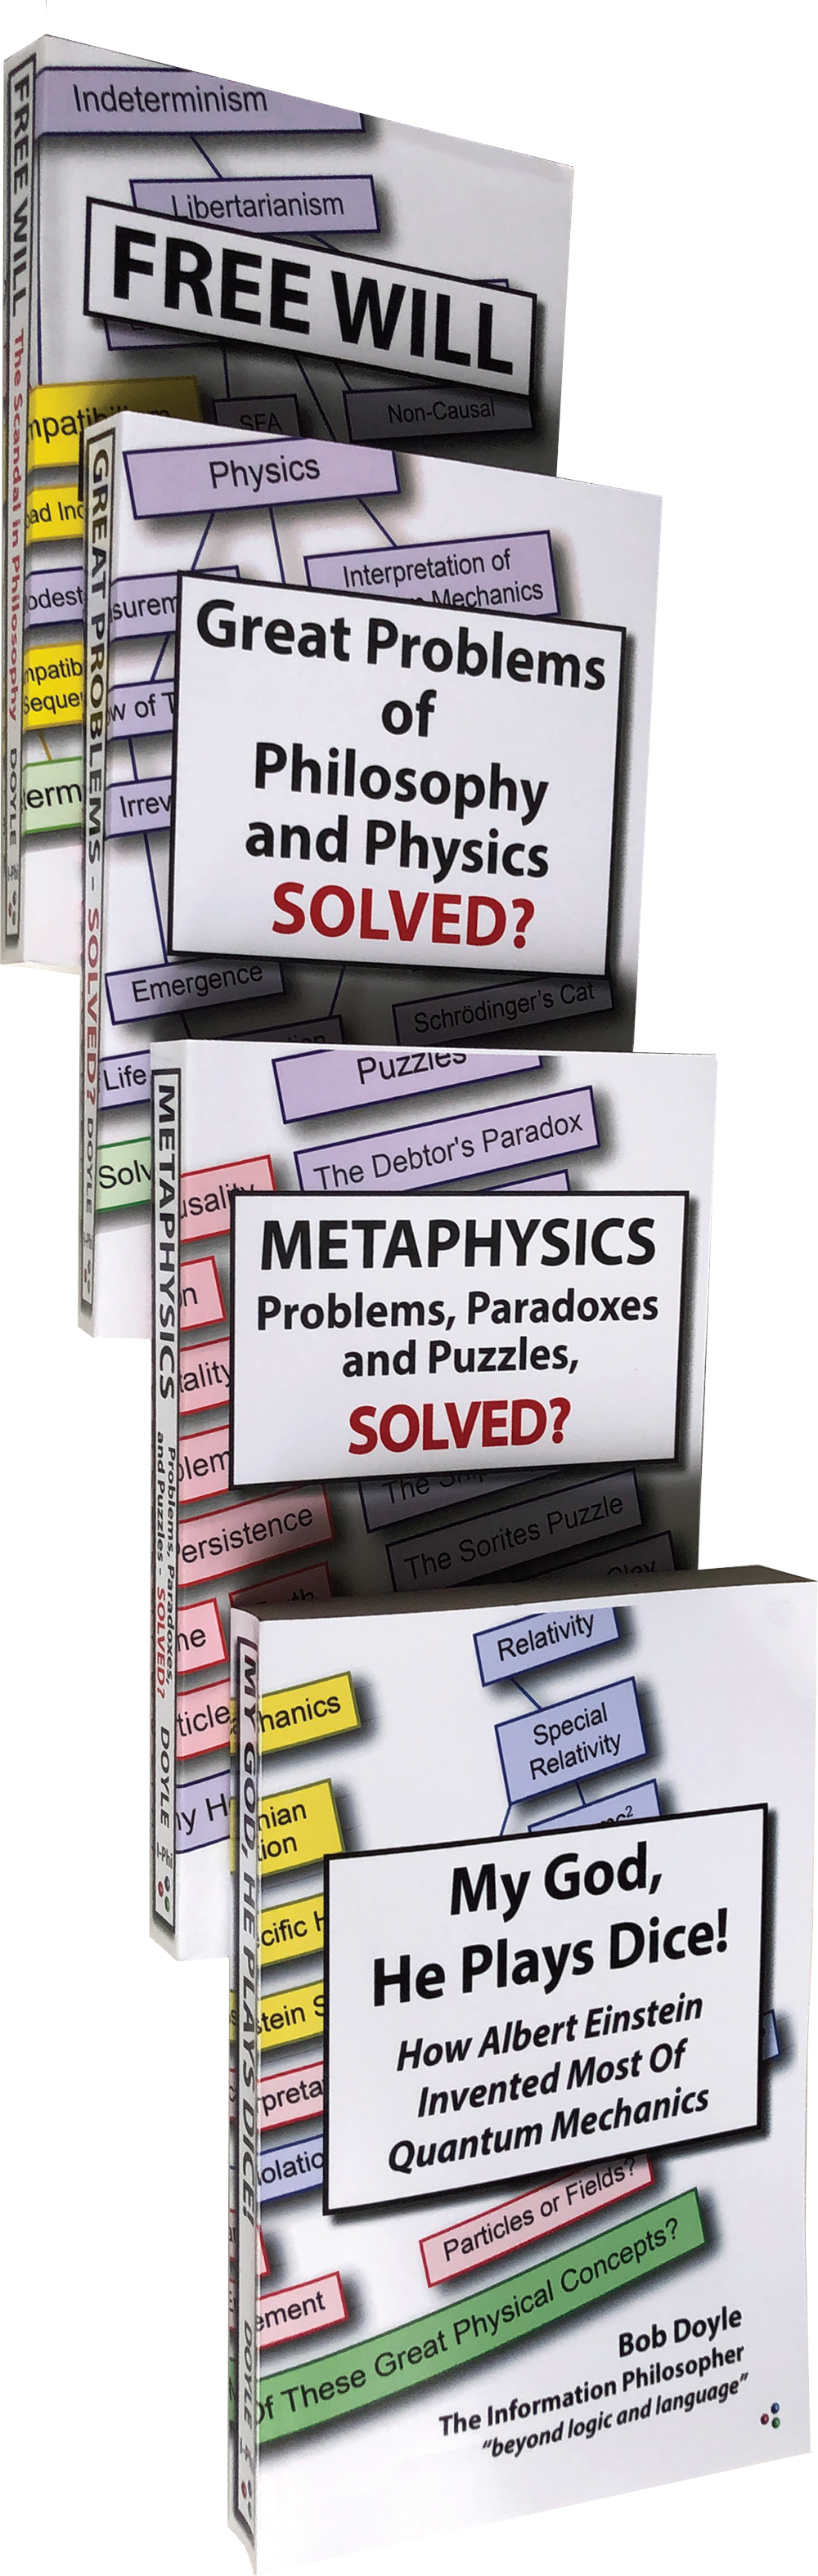 The Information Philosopher Dedicated To The New Information Philosophy Philosophy Metaphysics Quantum Mechanics